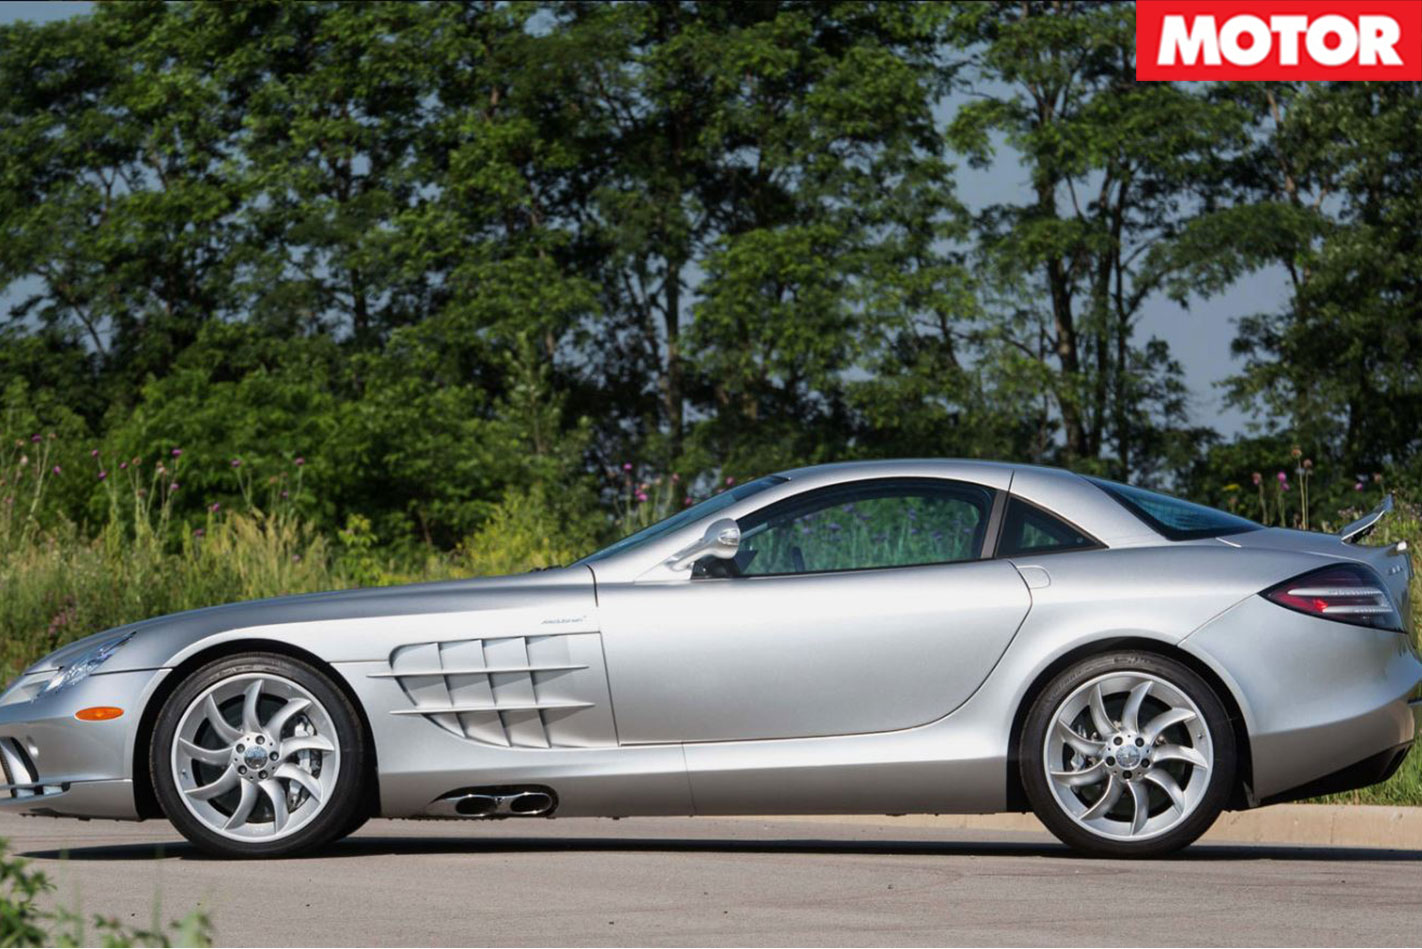 Mercedes McLaren SLR side